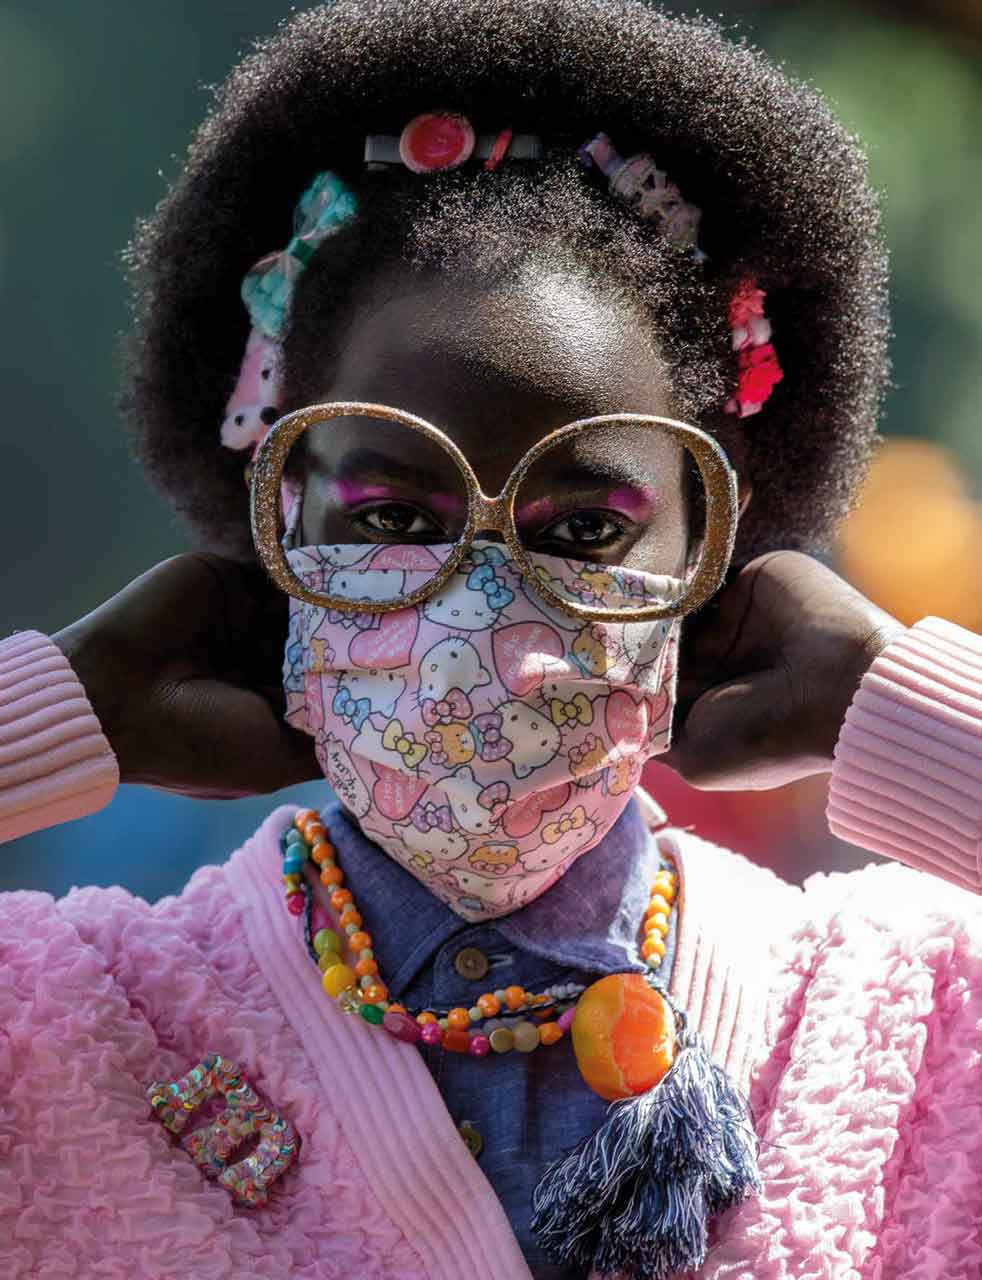 Ketahui Cara Pakai Masker yang Benar, Diikuti Tips Atasi Masalah Kacamata Berembun